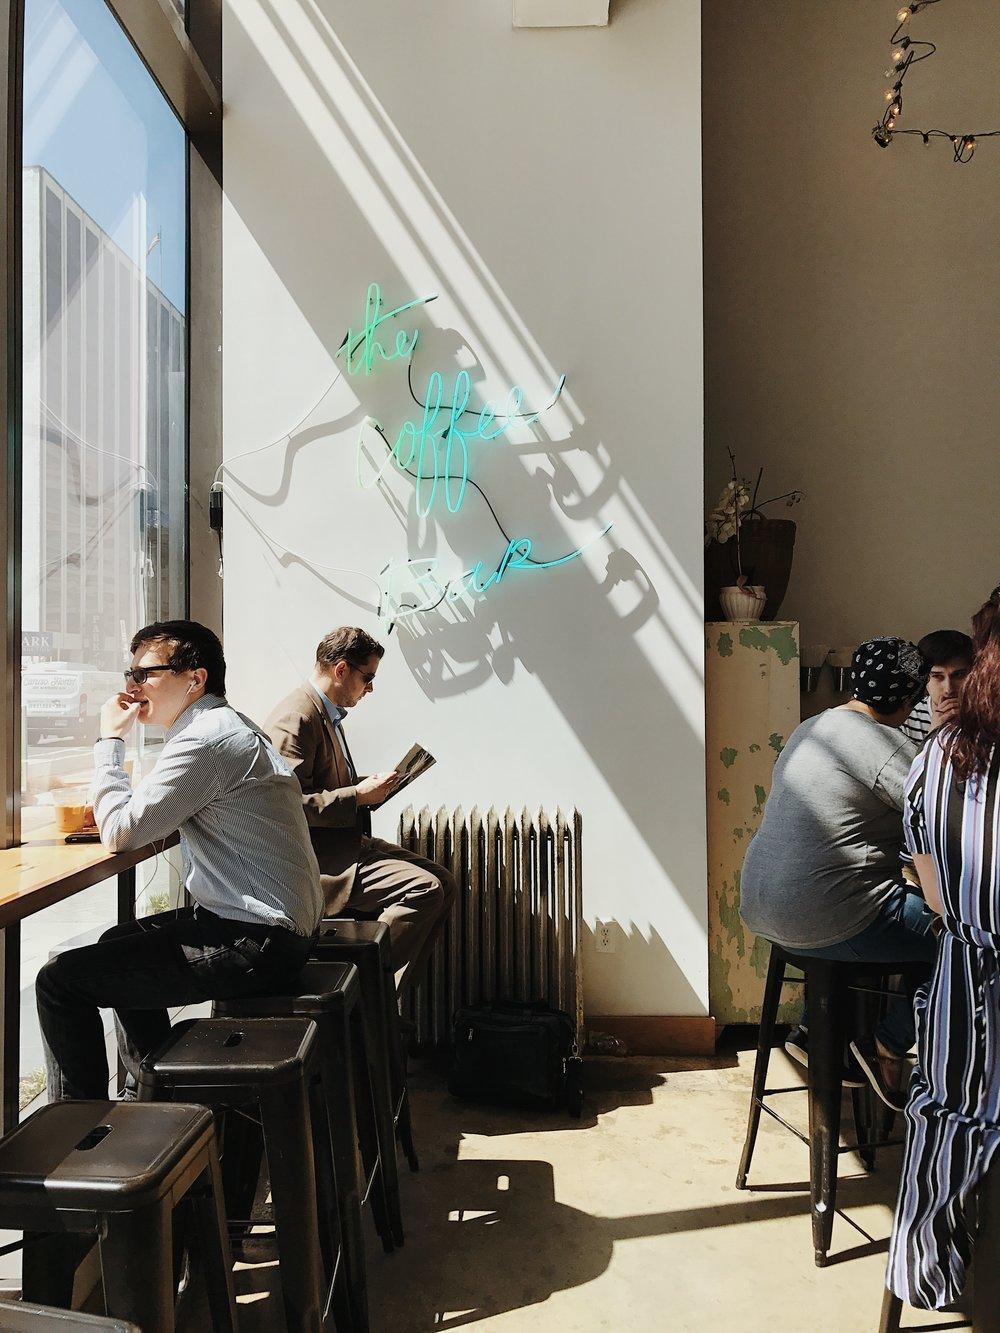 The Coffee Bar. Washington, D.C.